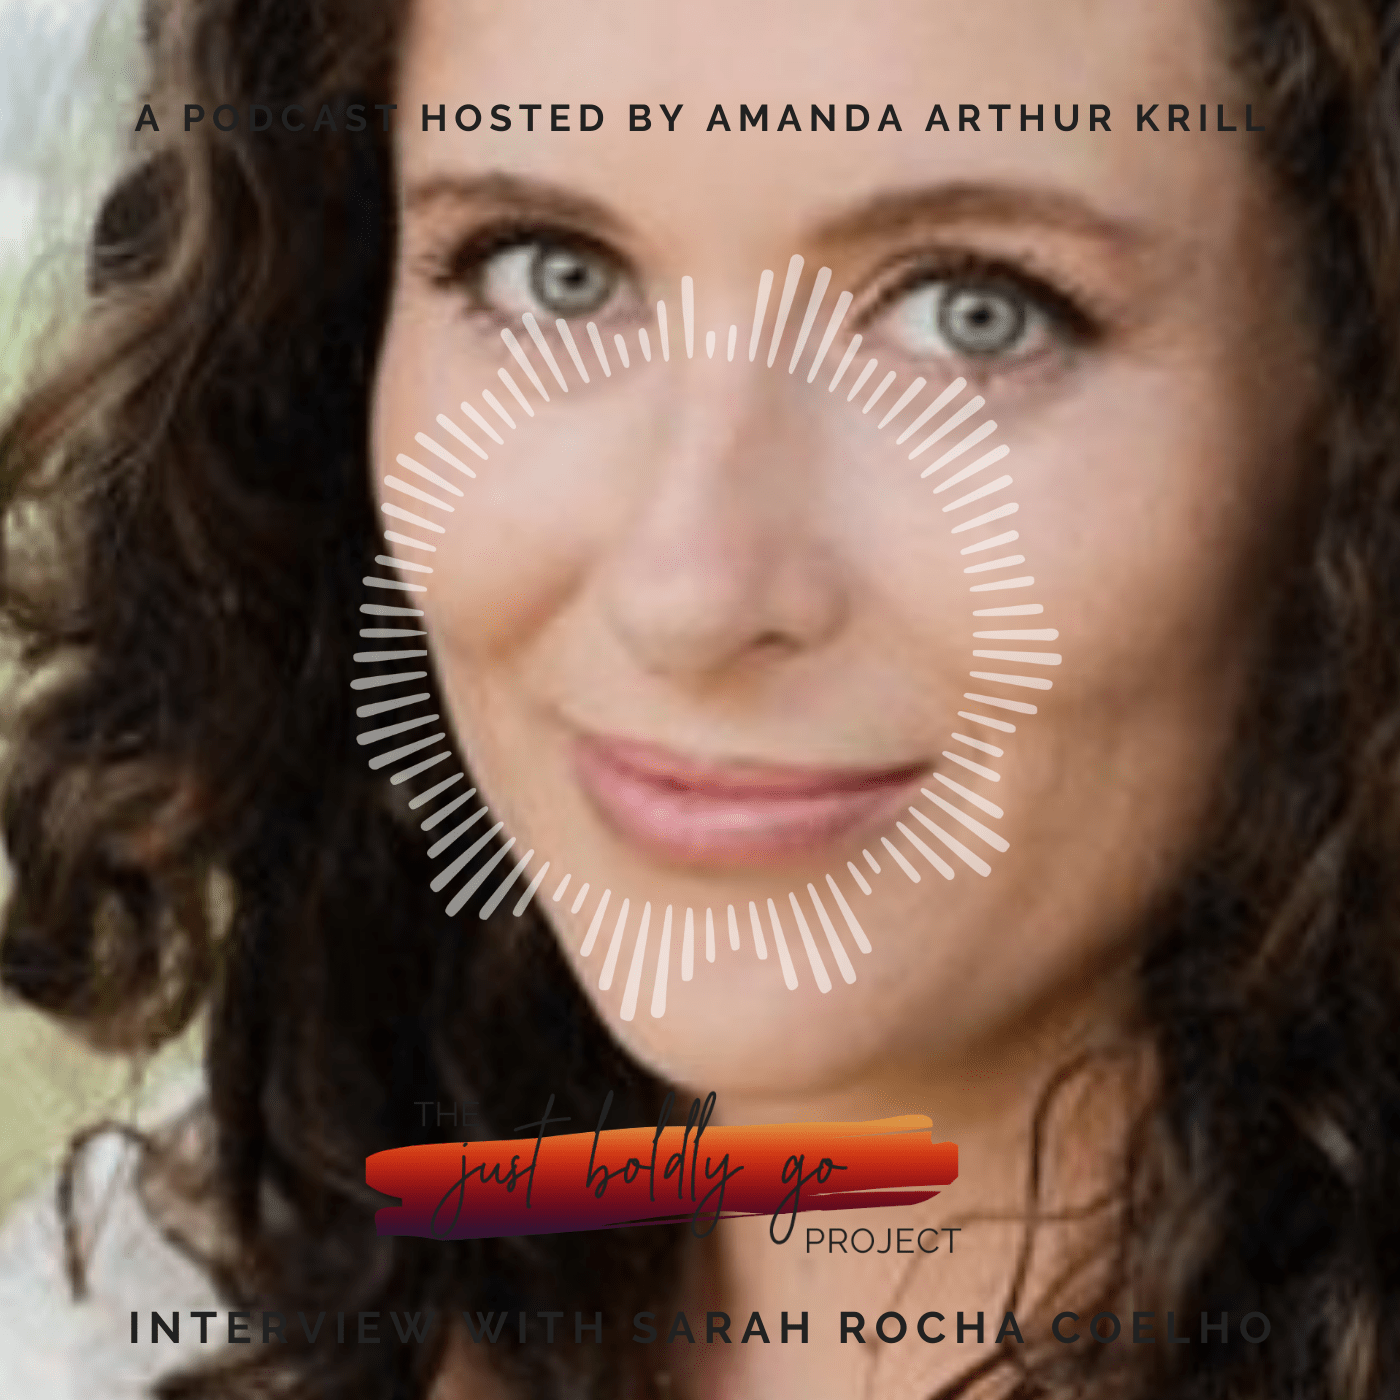 JBG Podcast: Interview with Sarah Rocha Coelho